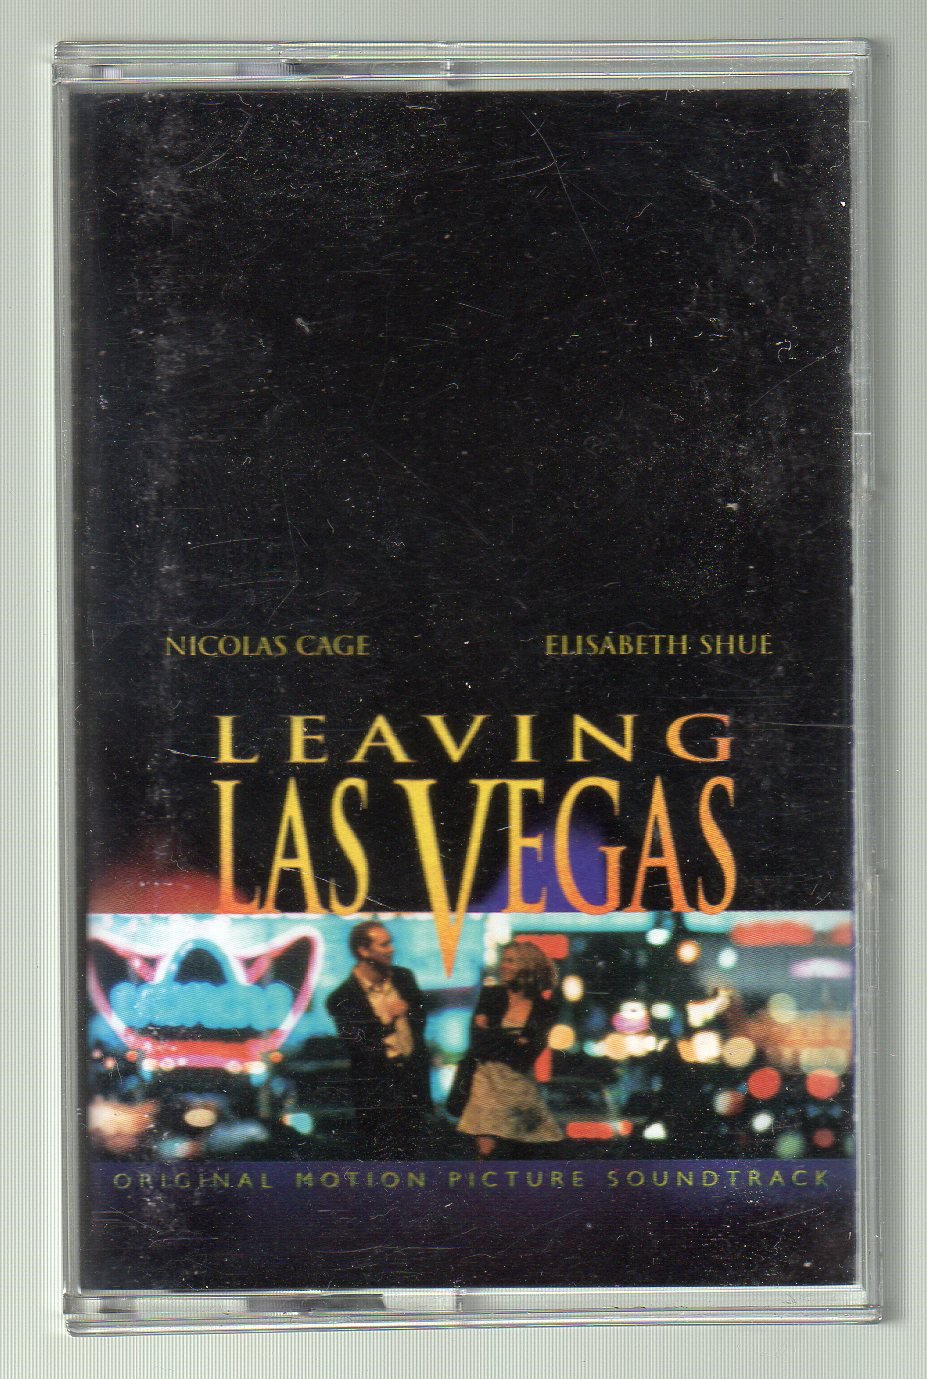 Motion Picture Soundtrack Cassette Tape